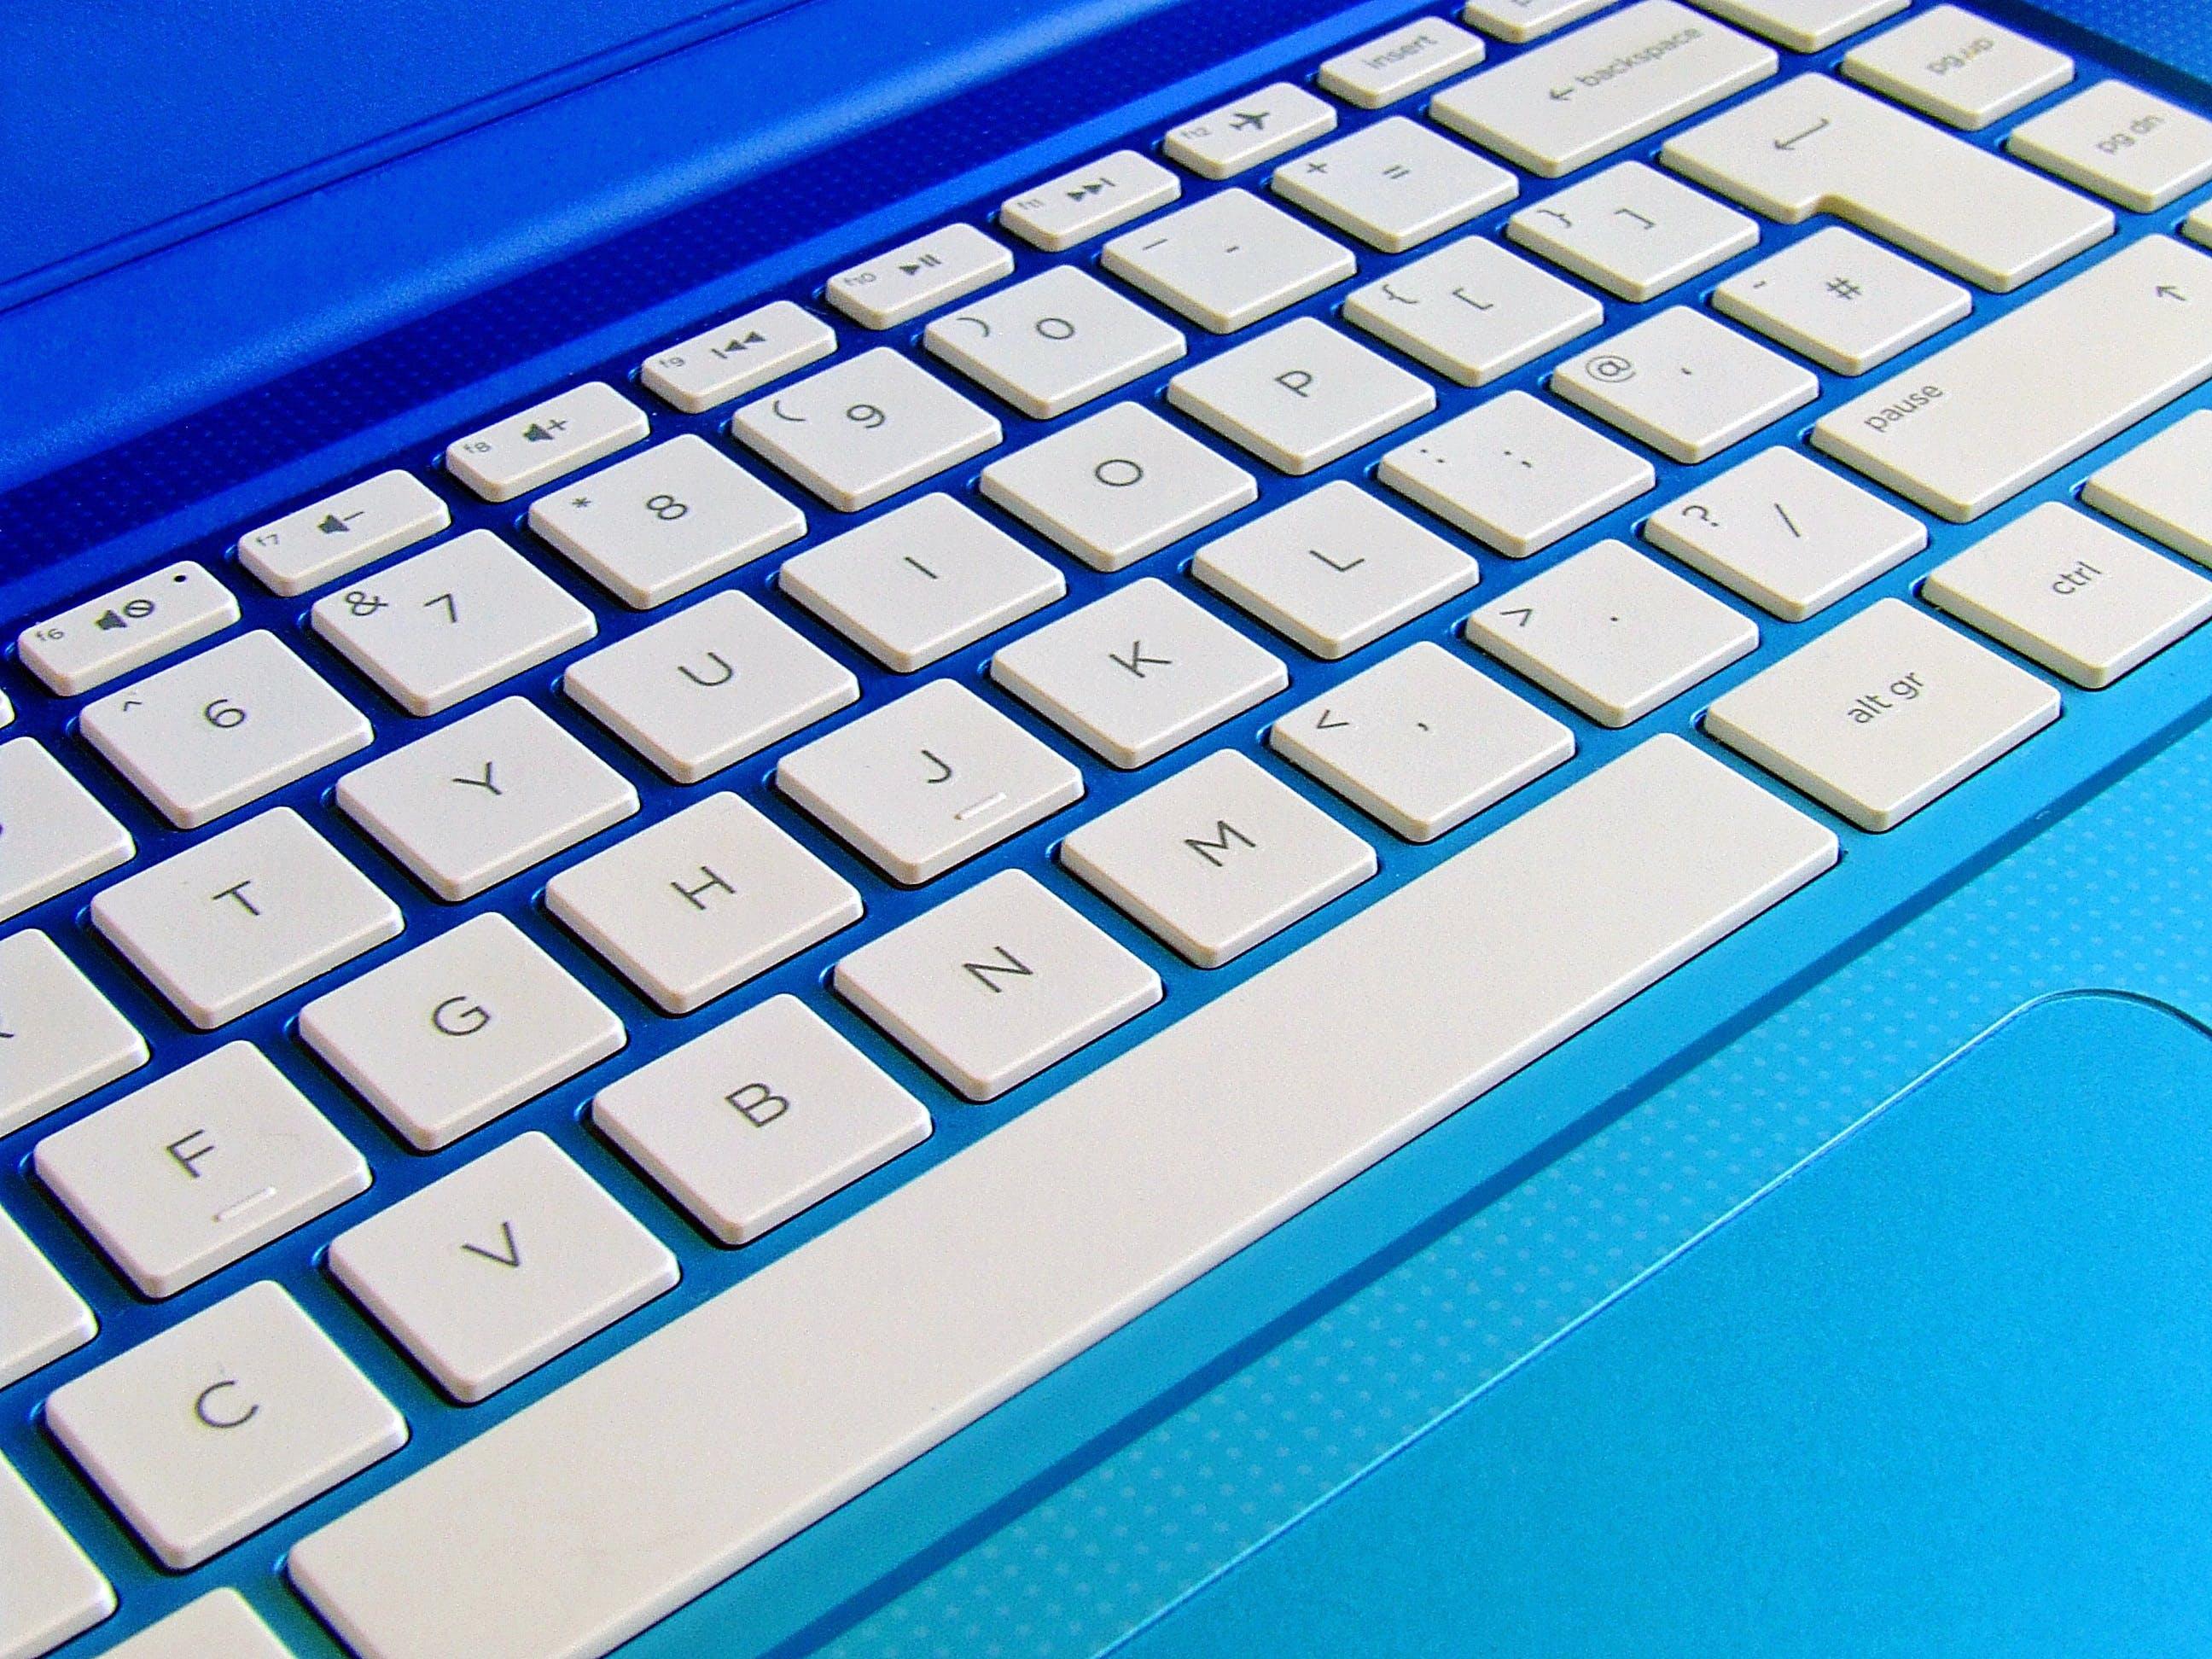 blue, close-up, computer